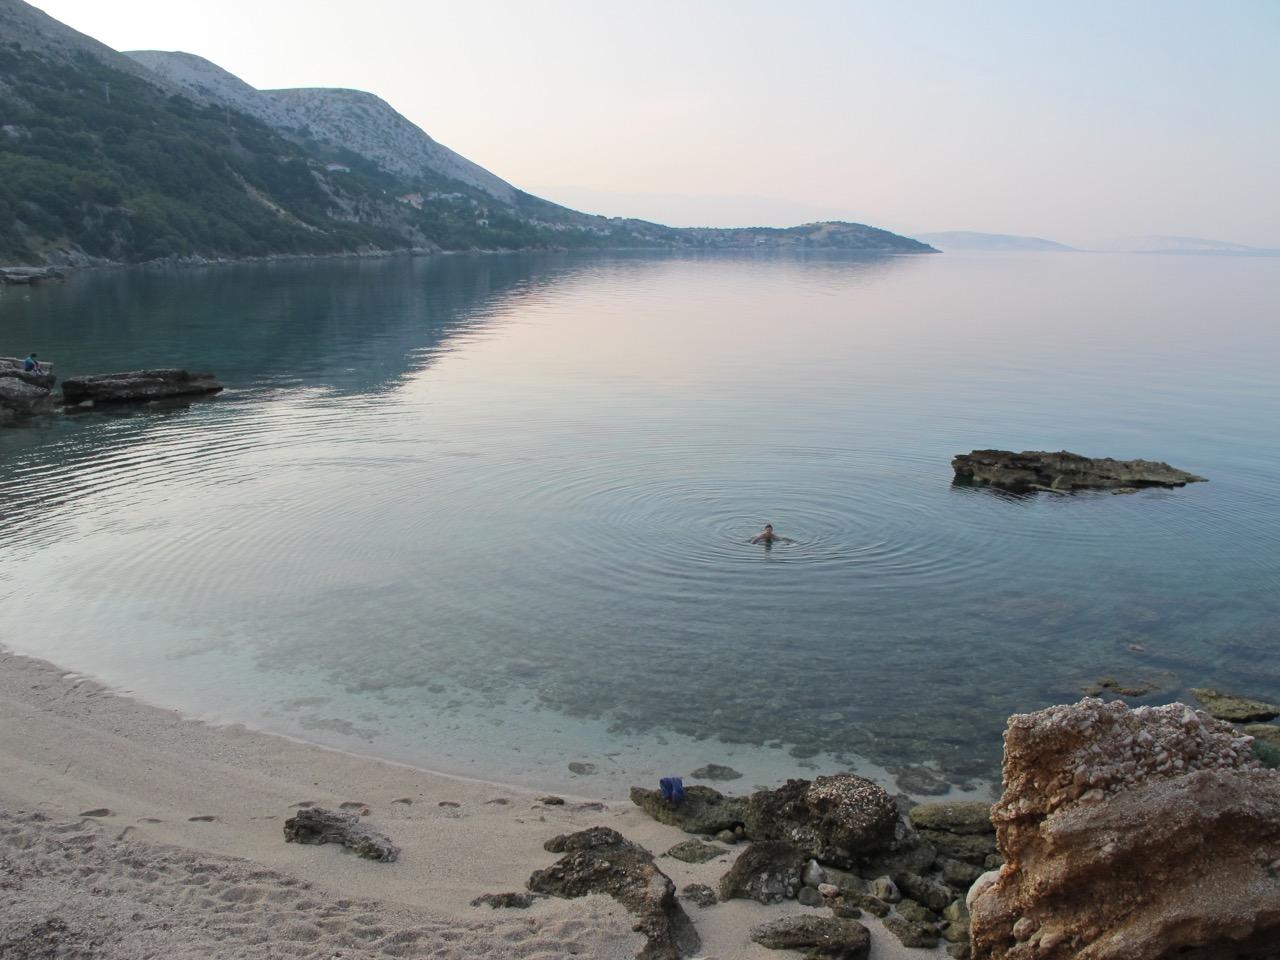 My morning swim in the Adriatic